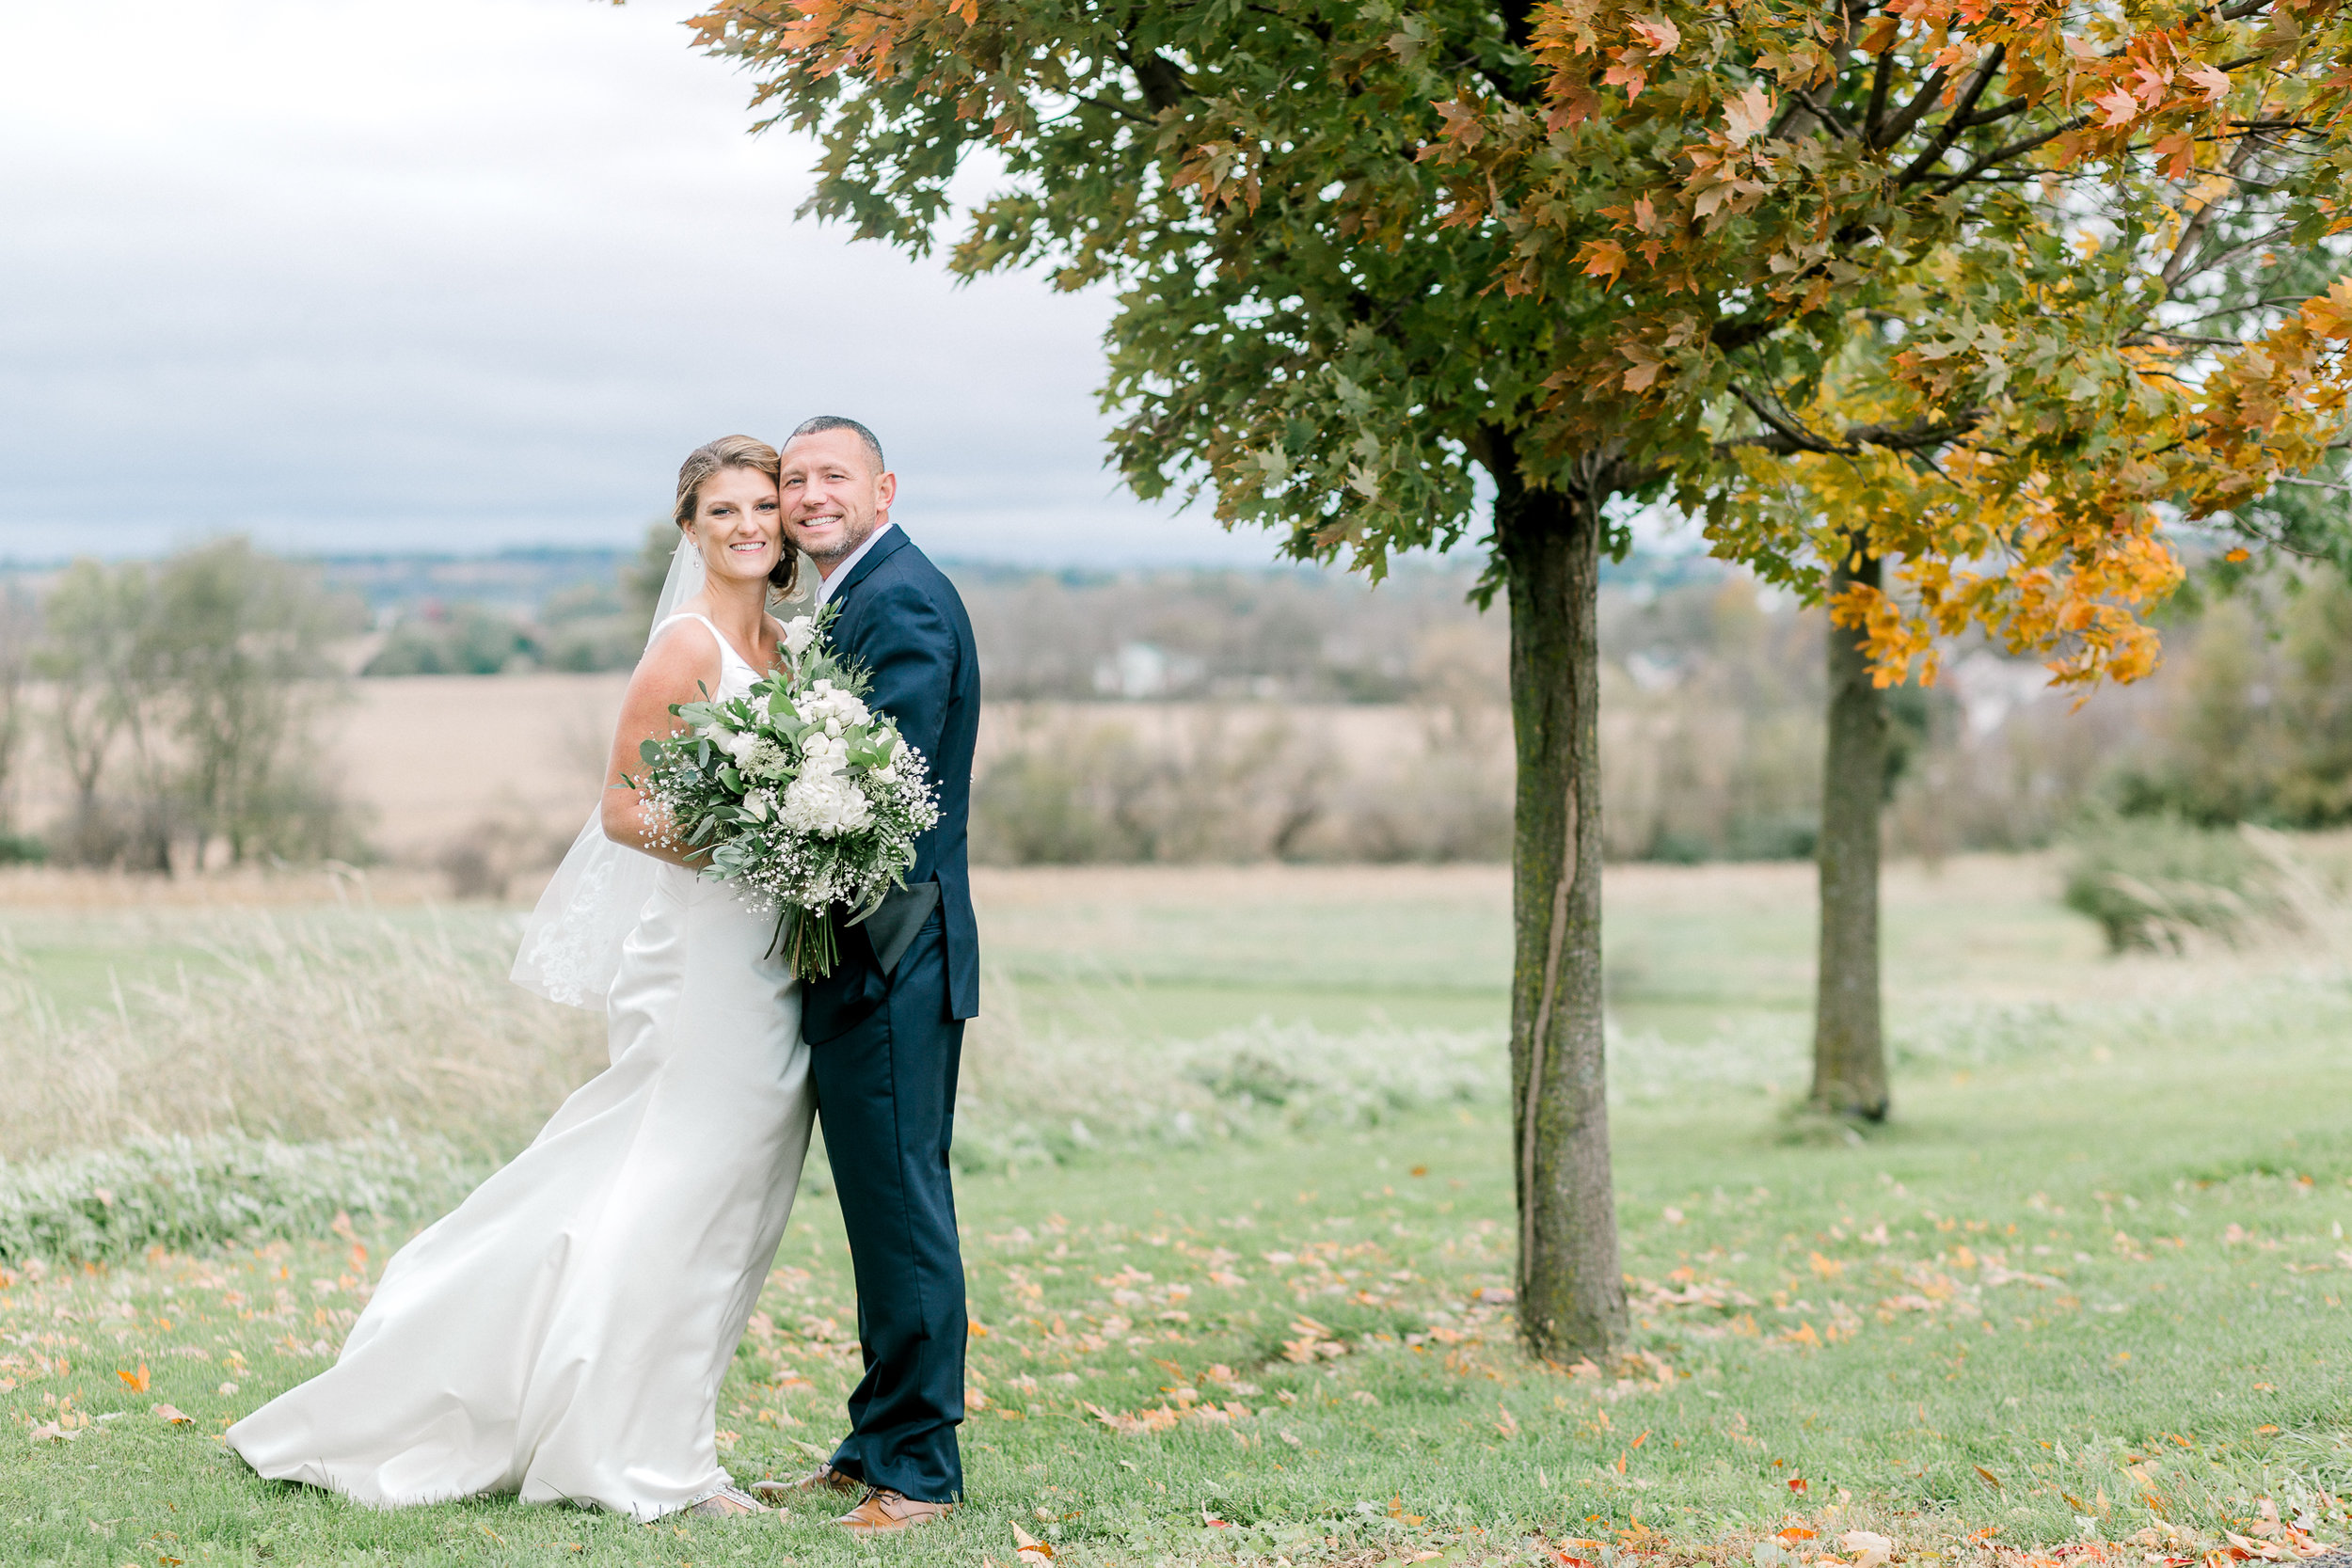 Pennsylvania October Fall Lehigh Valley wedding and lifestyle photographer Lytle Photo Co (86 of 167).jpg